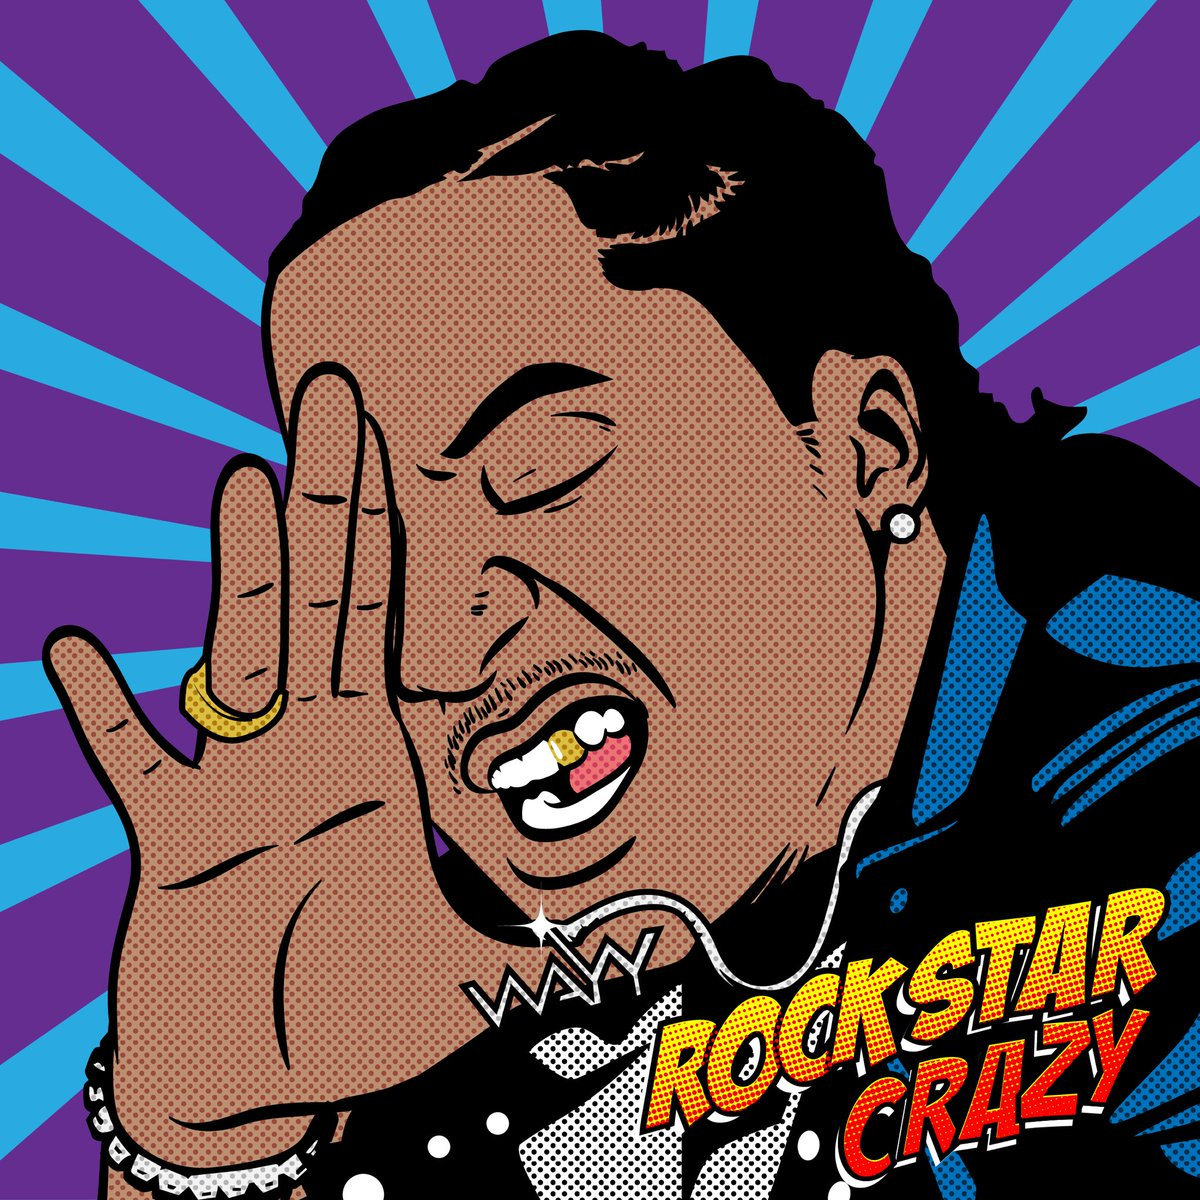 K Camp Rockstar Crazy